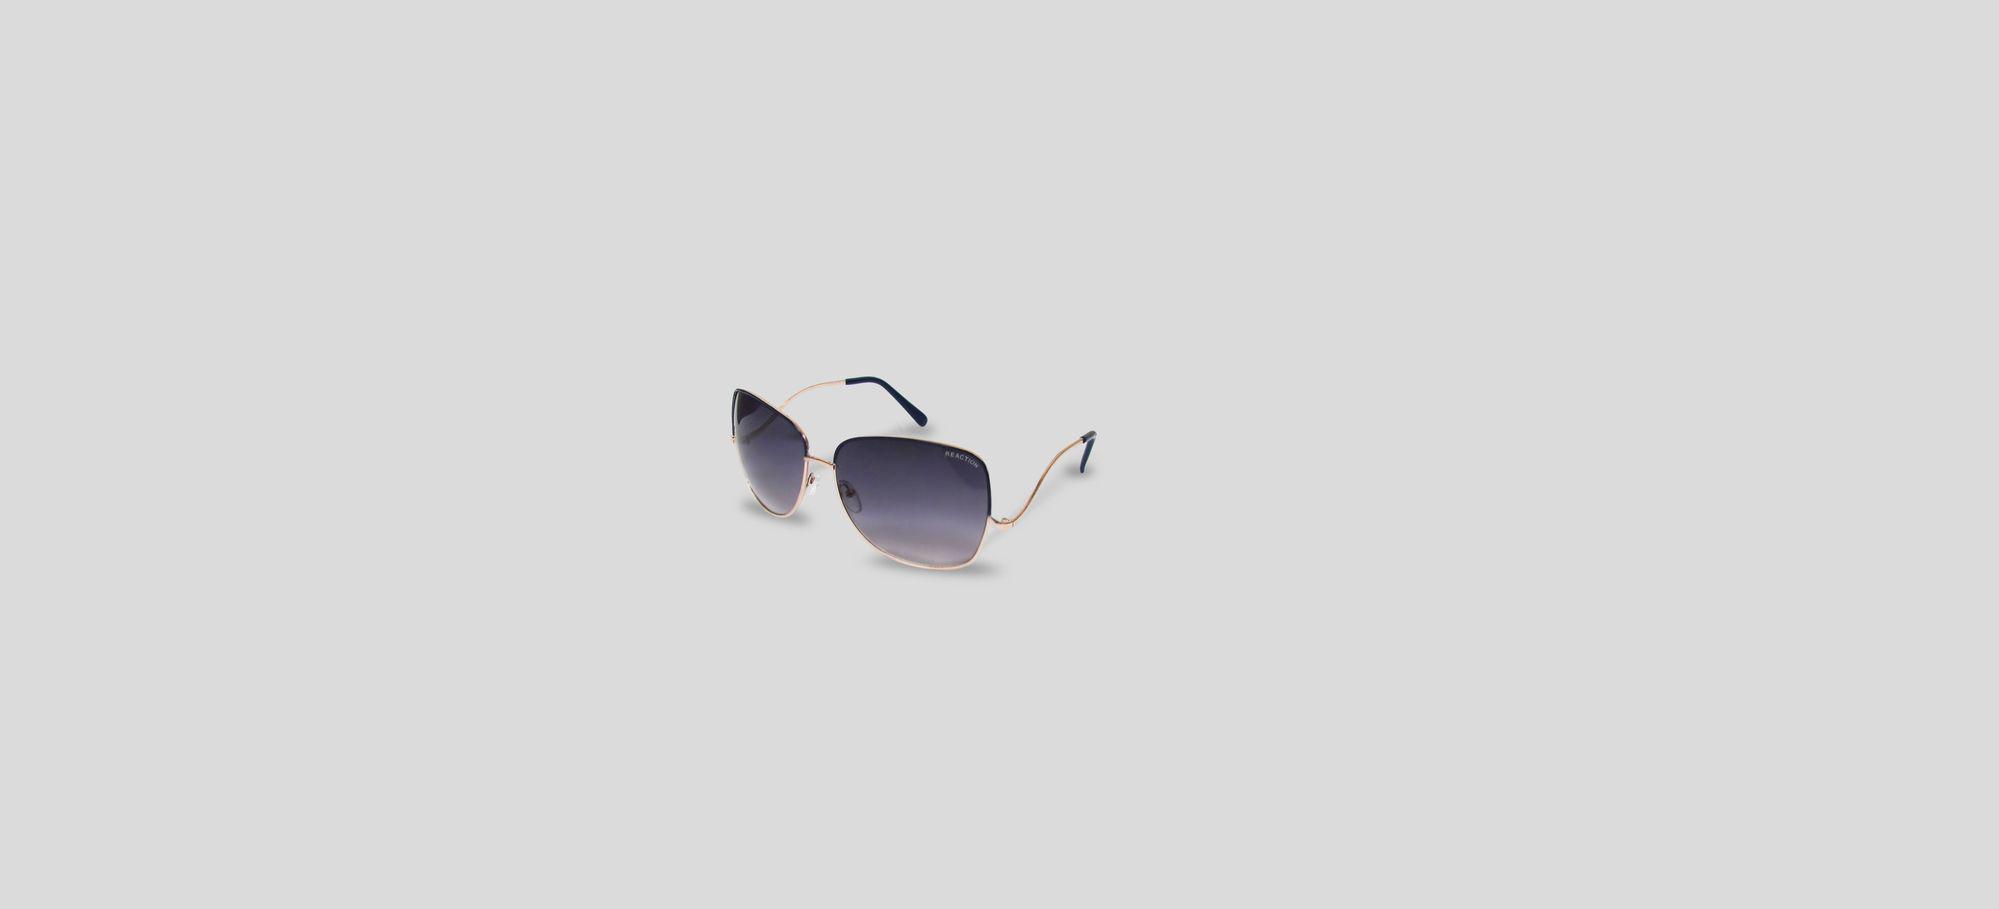 Shiny Black Fashion Cat Eye Sunglasses Kenneth Cole Reaction abyC4a2e